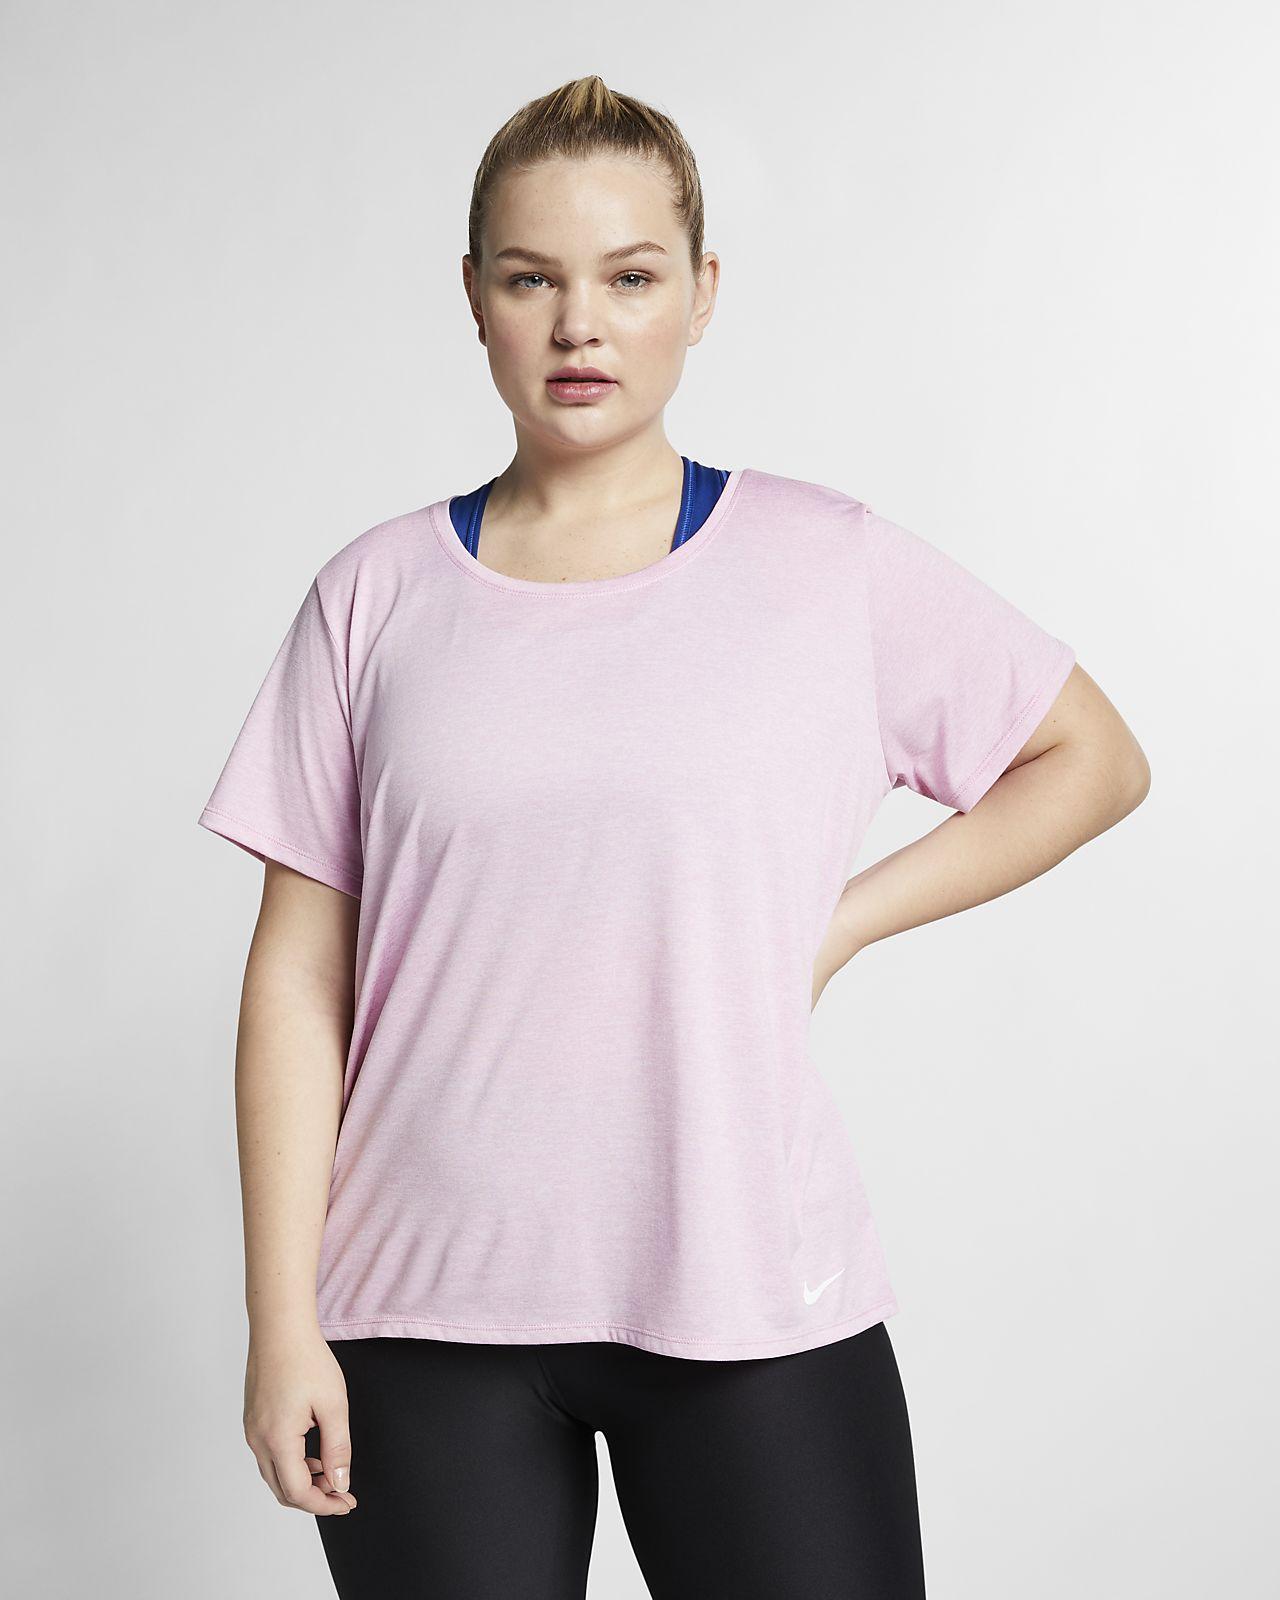 bad454602c Nike Dri-FIT Legend (Plus Size) Women s Short Sleeve Training Top ...